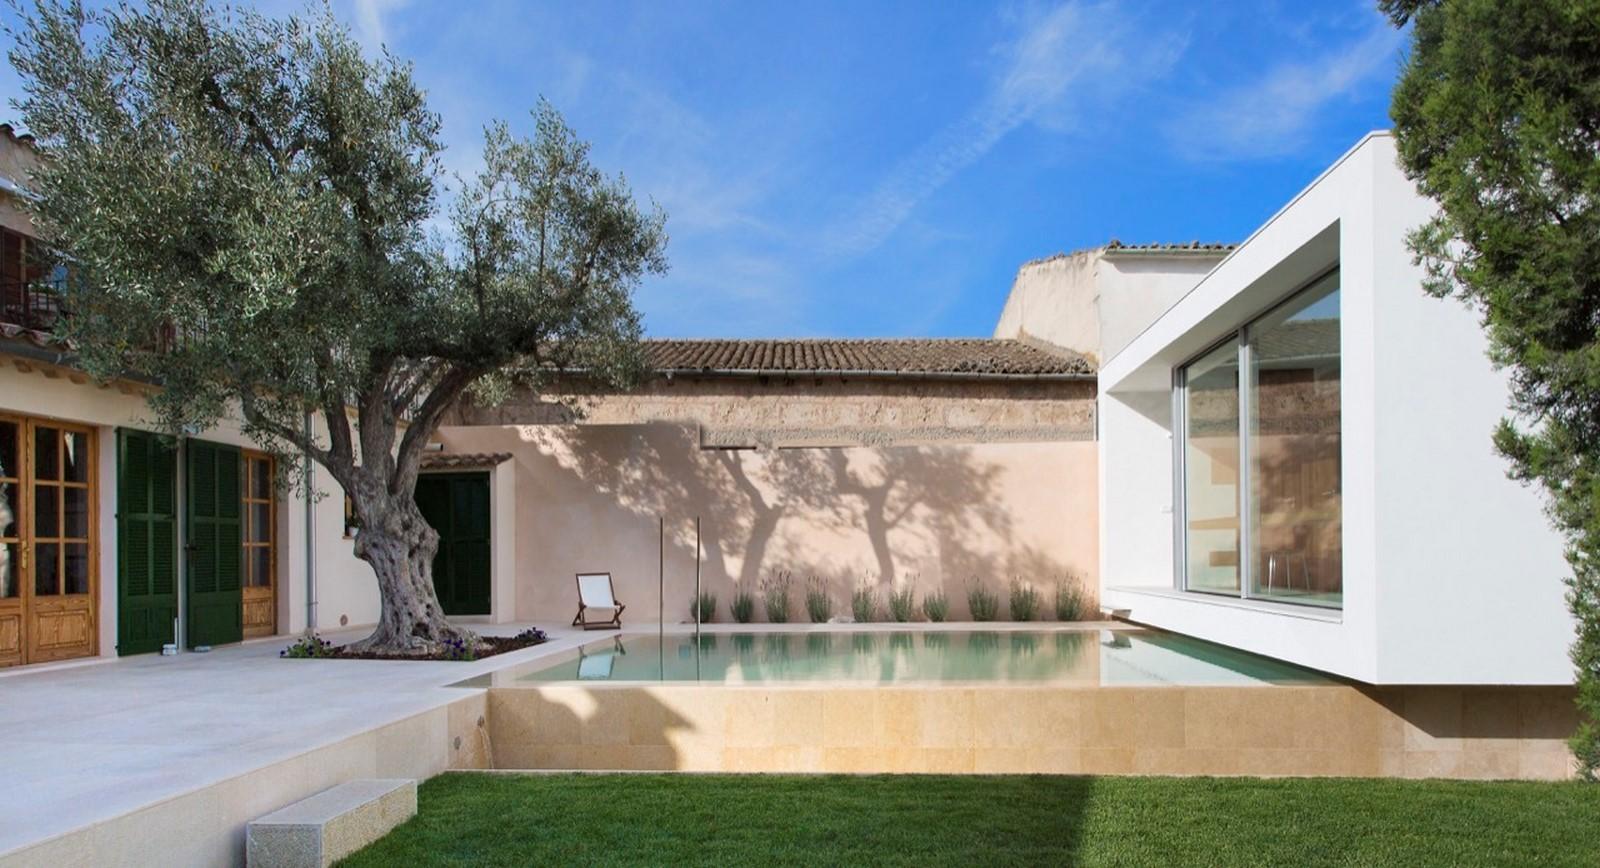 Swimming Pool And Studio, by Joan Miquel Segui + Tono Vila - Sheet2